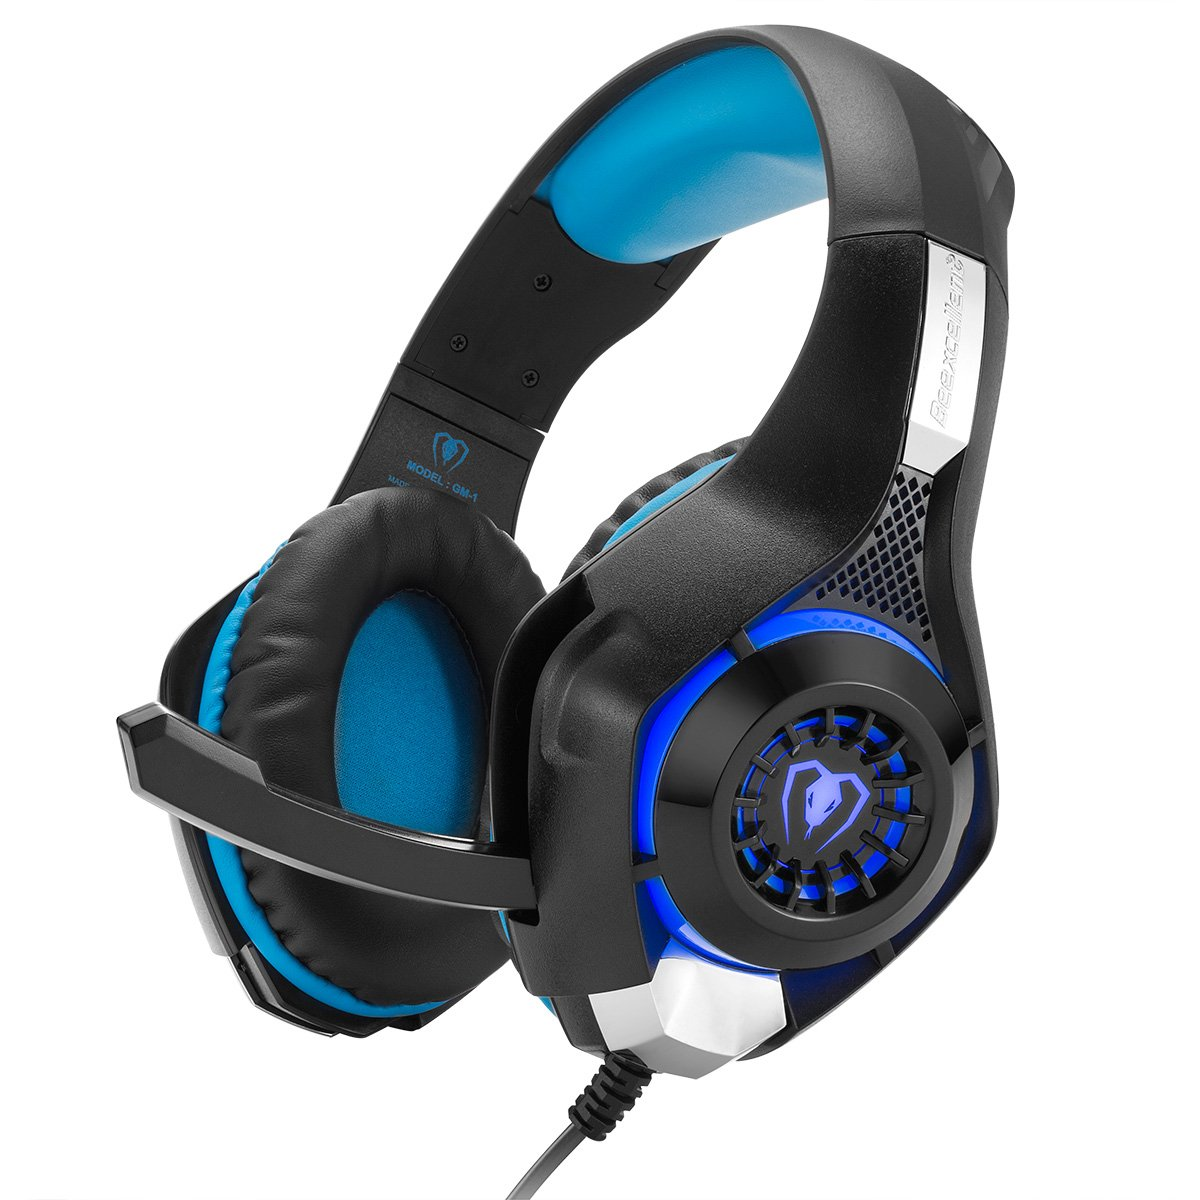 Cuffie Gaming, GM-1 Bass Gaming Headset Avanzate per PC PS4 Xbox One Laptop iPhone iMac iPad, con Microfono Adattatore Cavo - Nero & Blu Cocar GM1